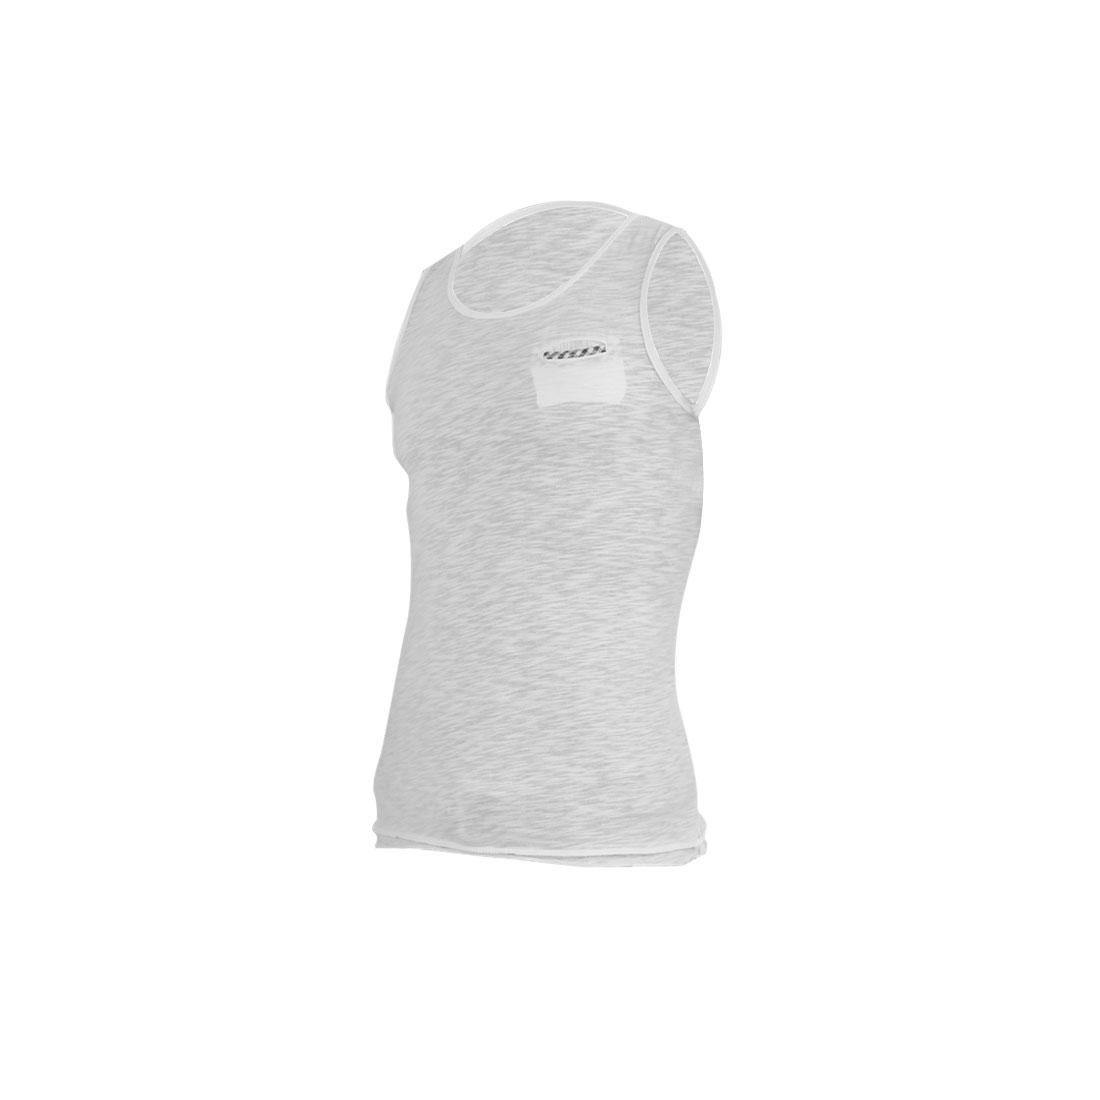 Men Straight Pullover Design Sleeveless Leisure Tank Top White S